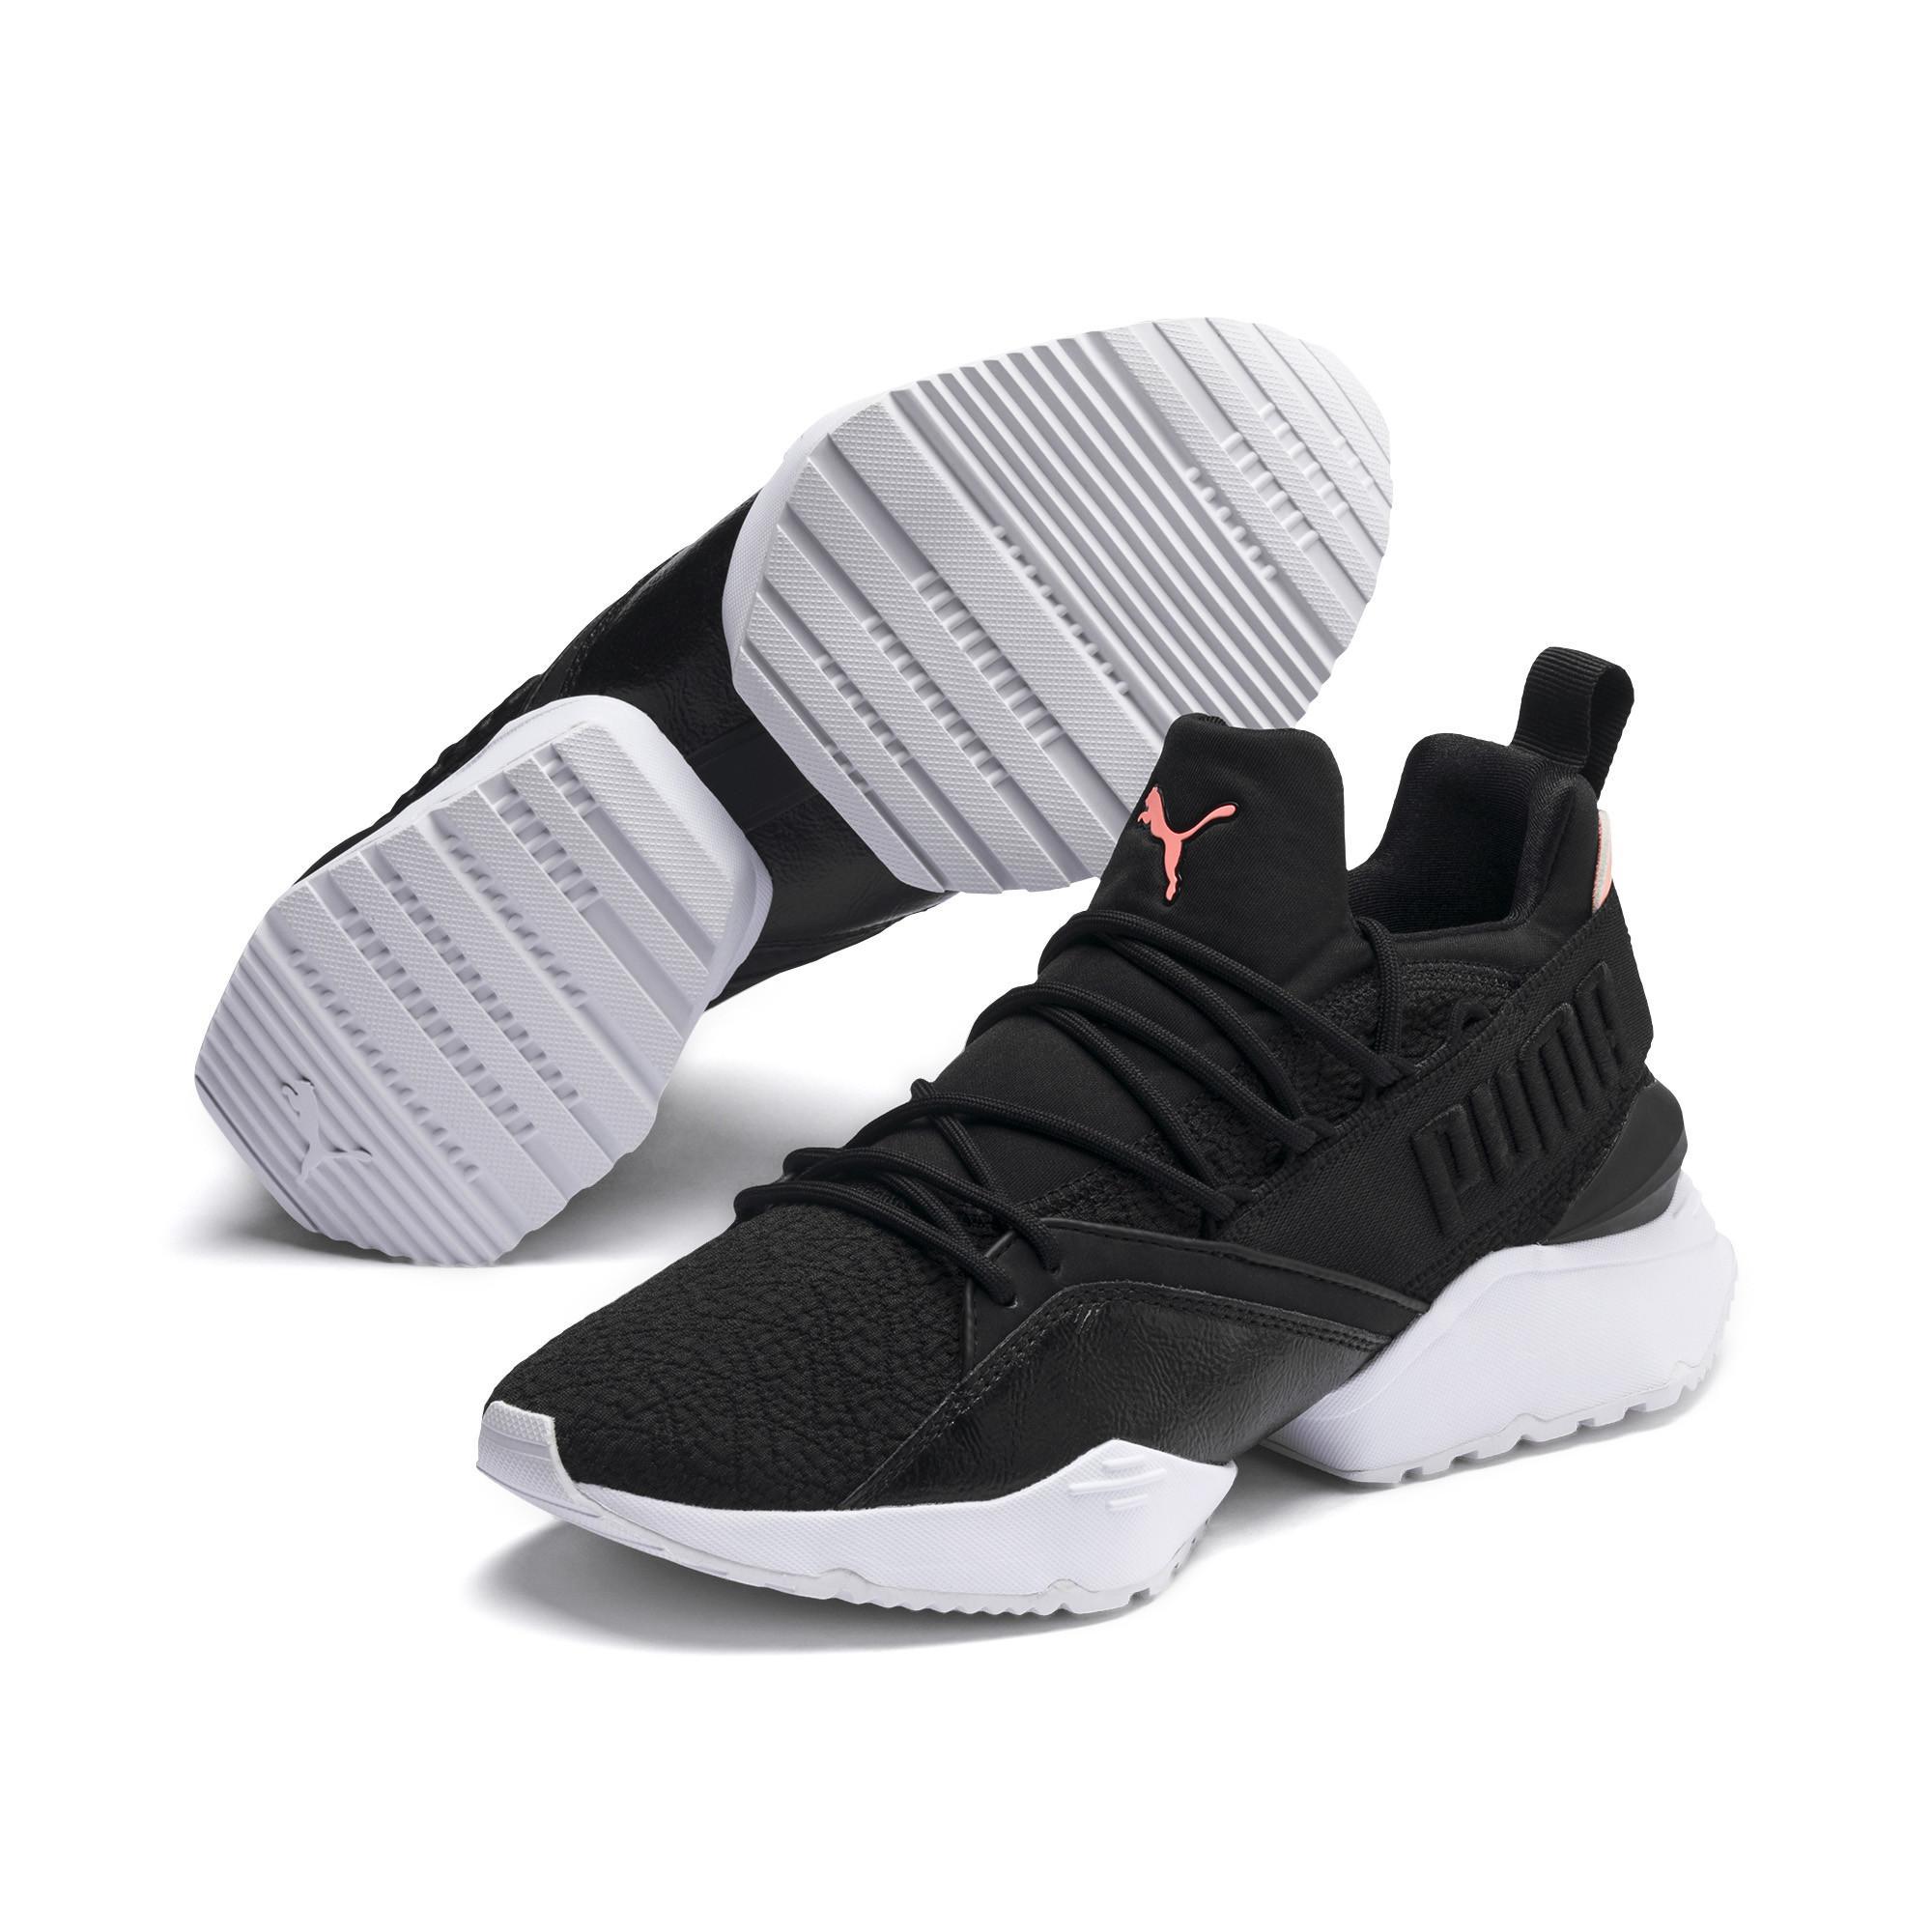 new styles 2b18f a1c83 PUMA - Black Muse Maia Bio Hacking Women s Sneakers - Lyst. View fullscreen